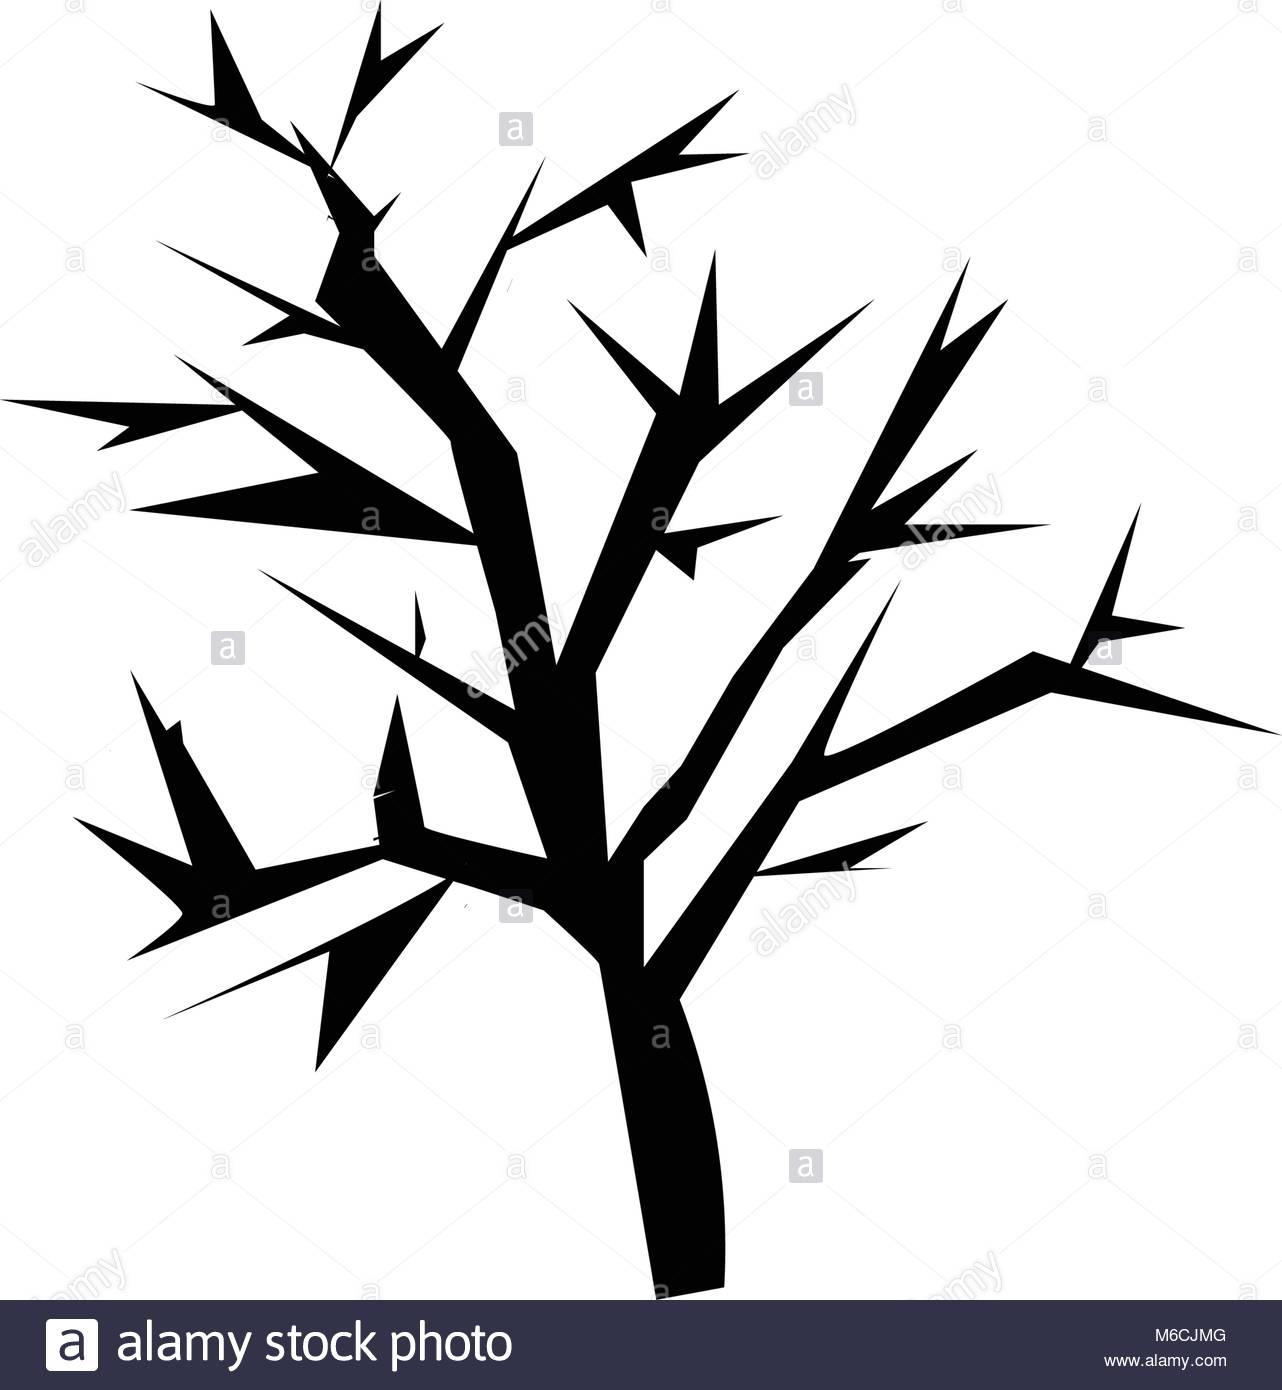 1282x1390 Mesquite Tree Silhouette On White Background Stock Vector Art